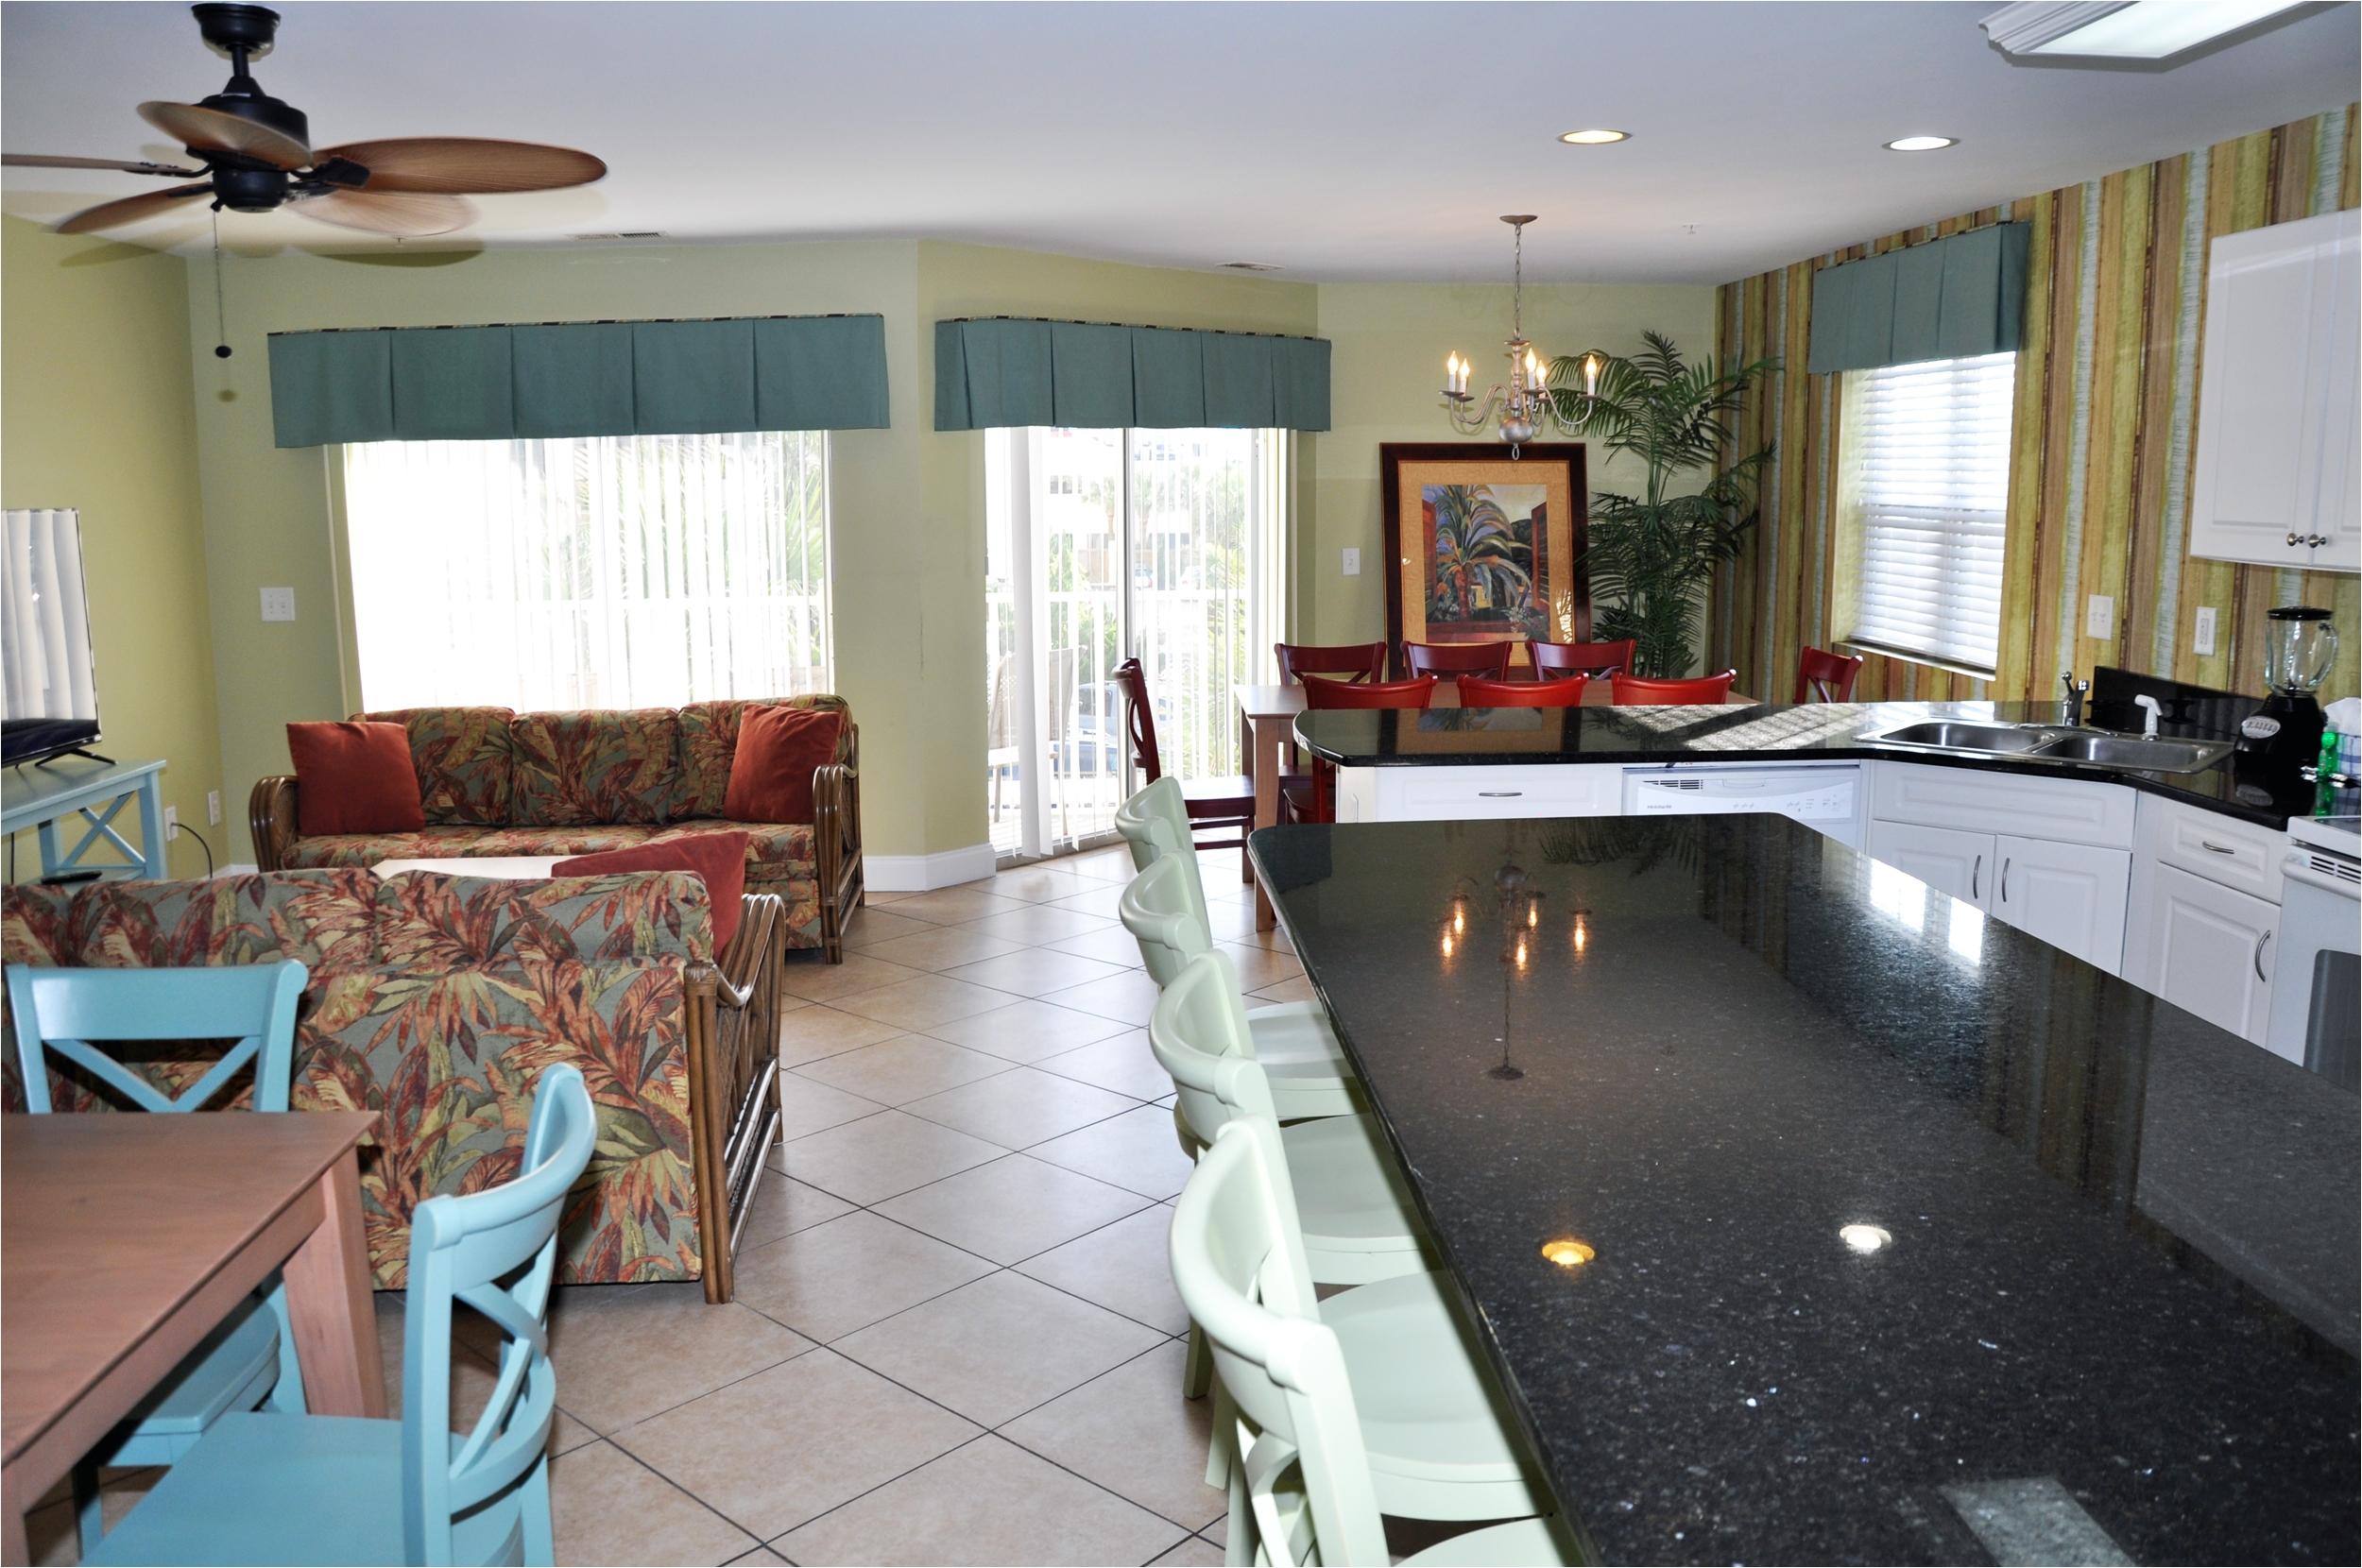 ambassador villas 201 vacation rental in north myrtle beach redawning